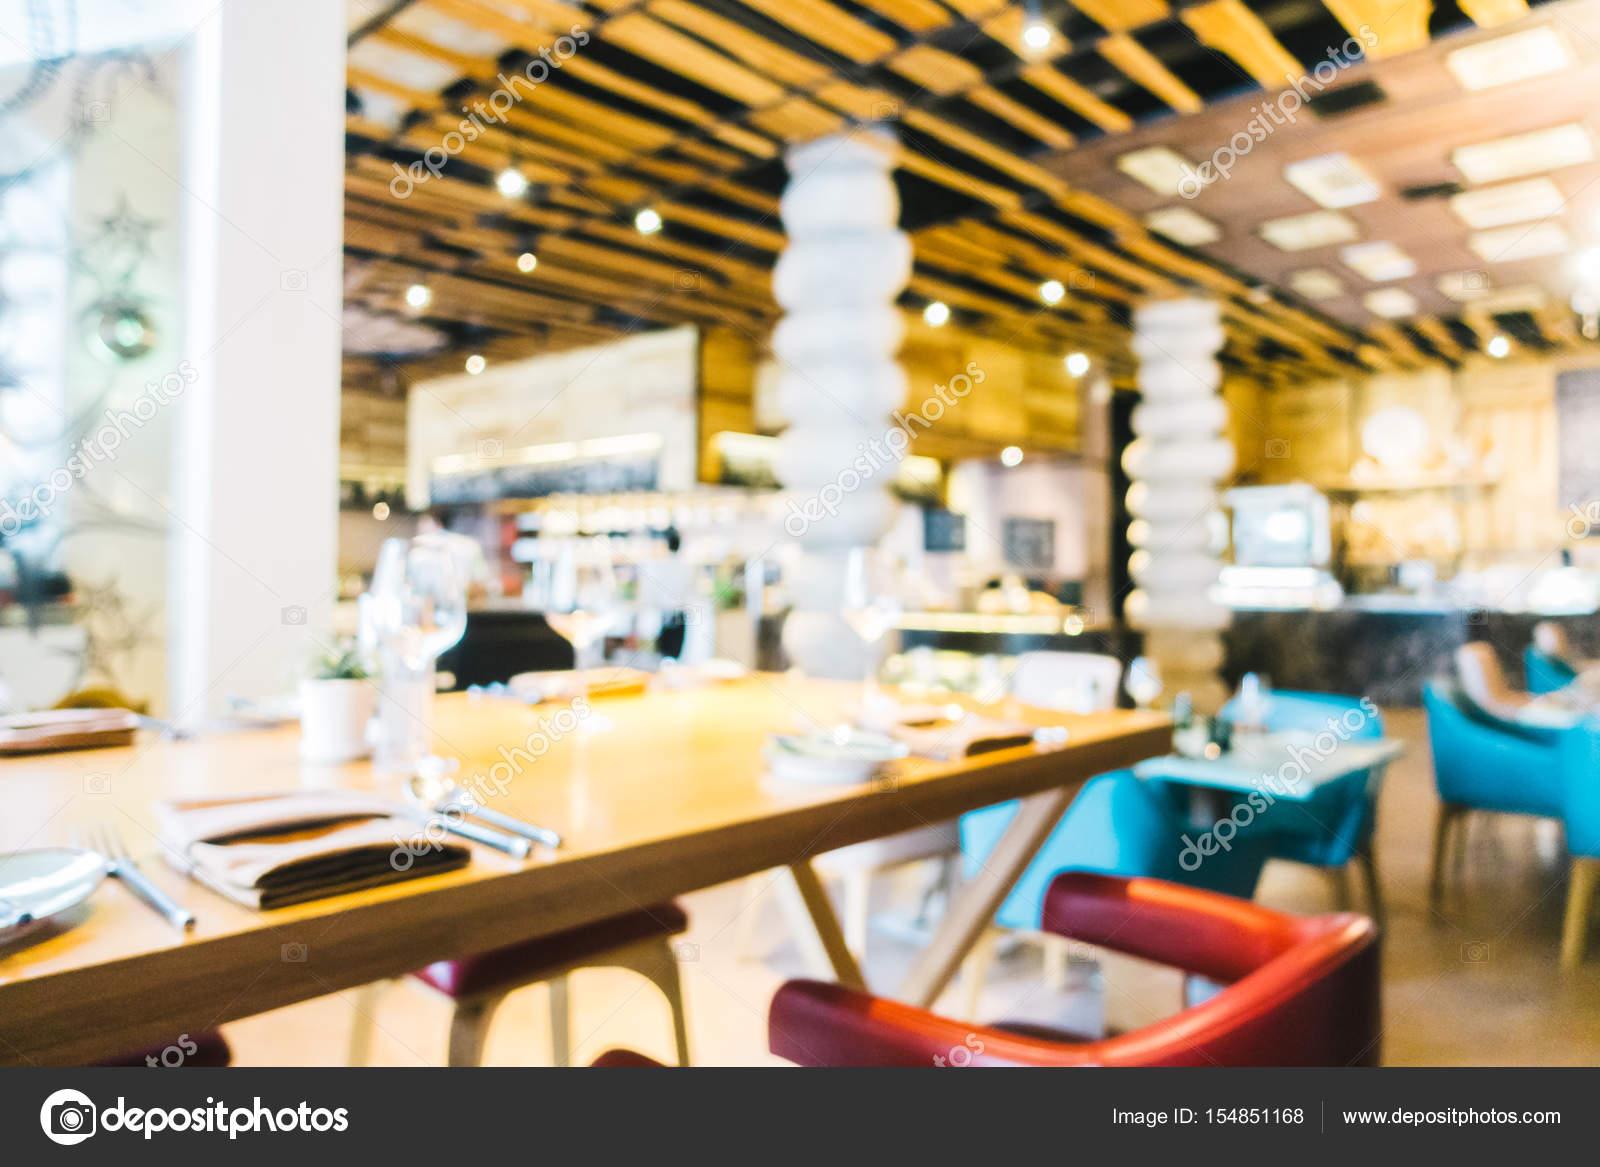 Resumen restaurante de Blur — Foto de stock © mrsiraphol #154851168